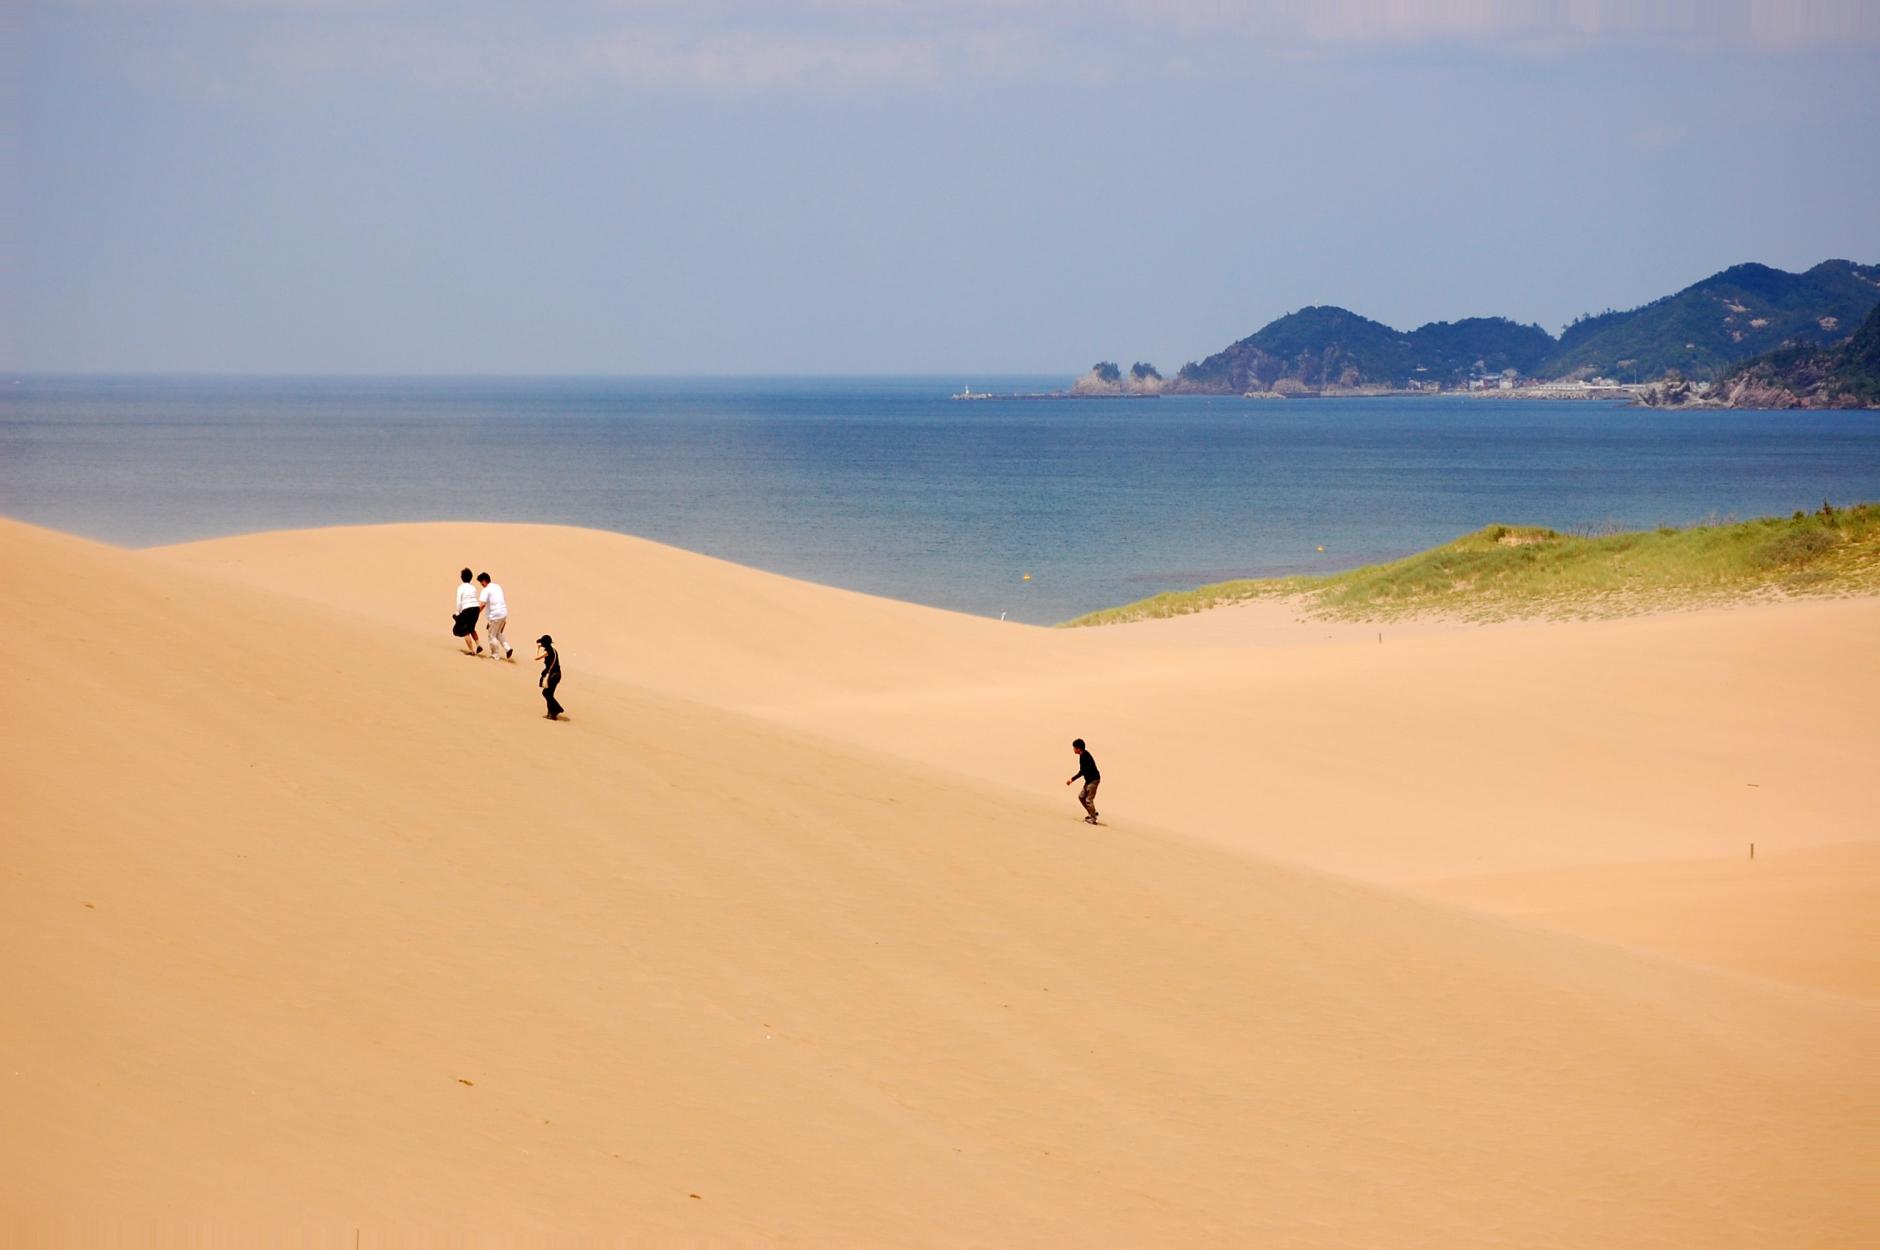 File:Tottori sanddunes 1.jpg